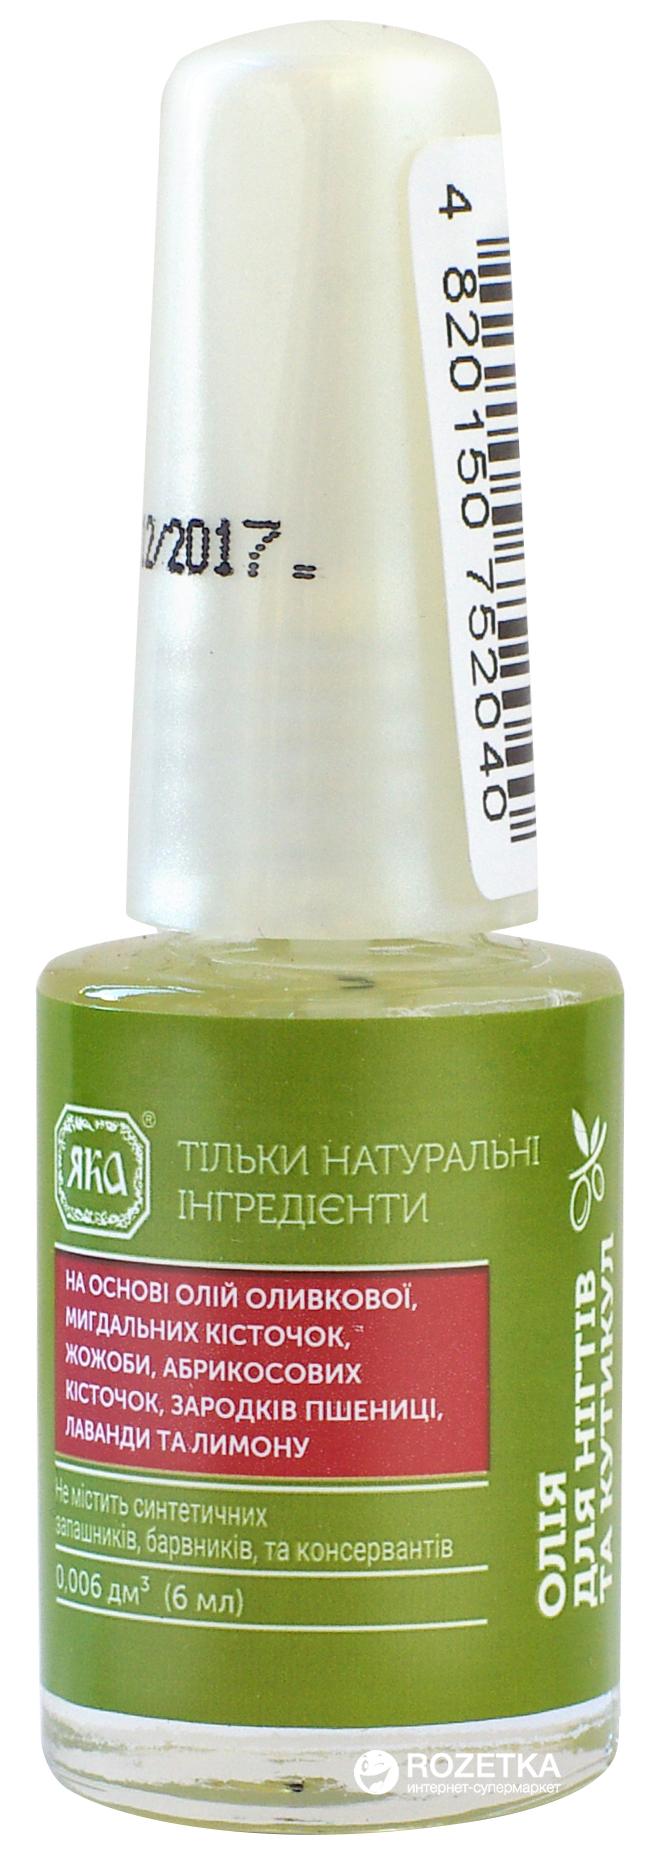 """Яка"" - Масло для ногтей и кутикулы, 39 грн"